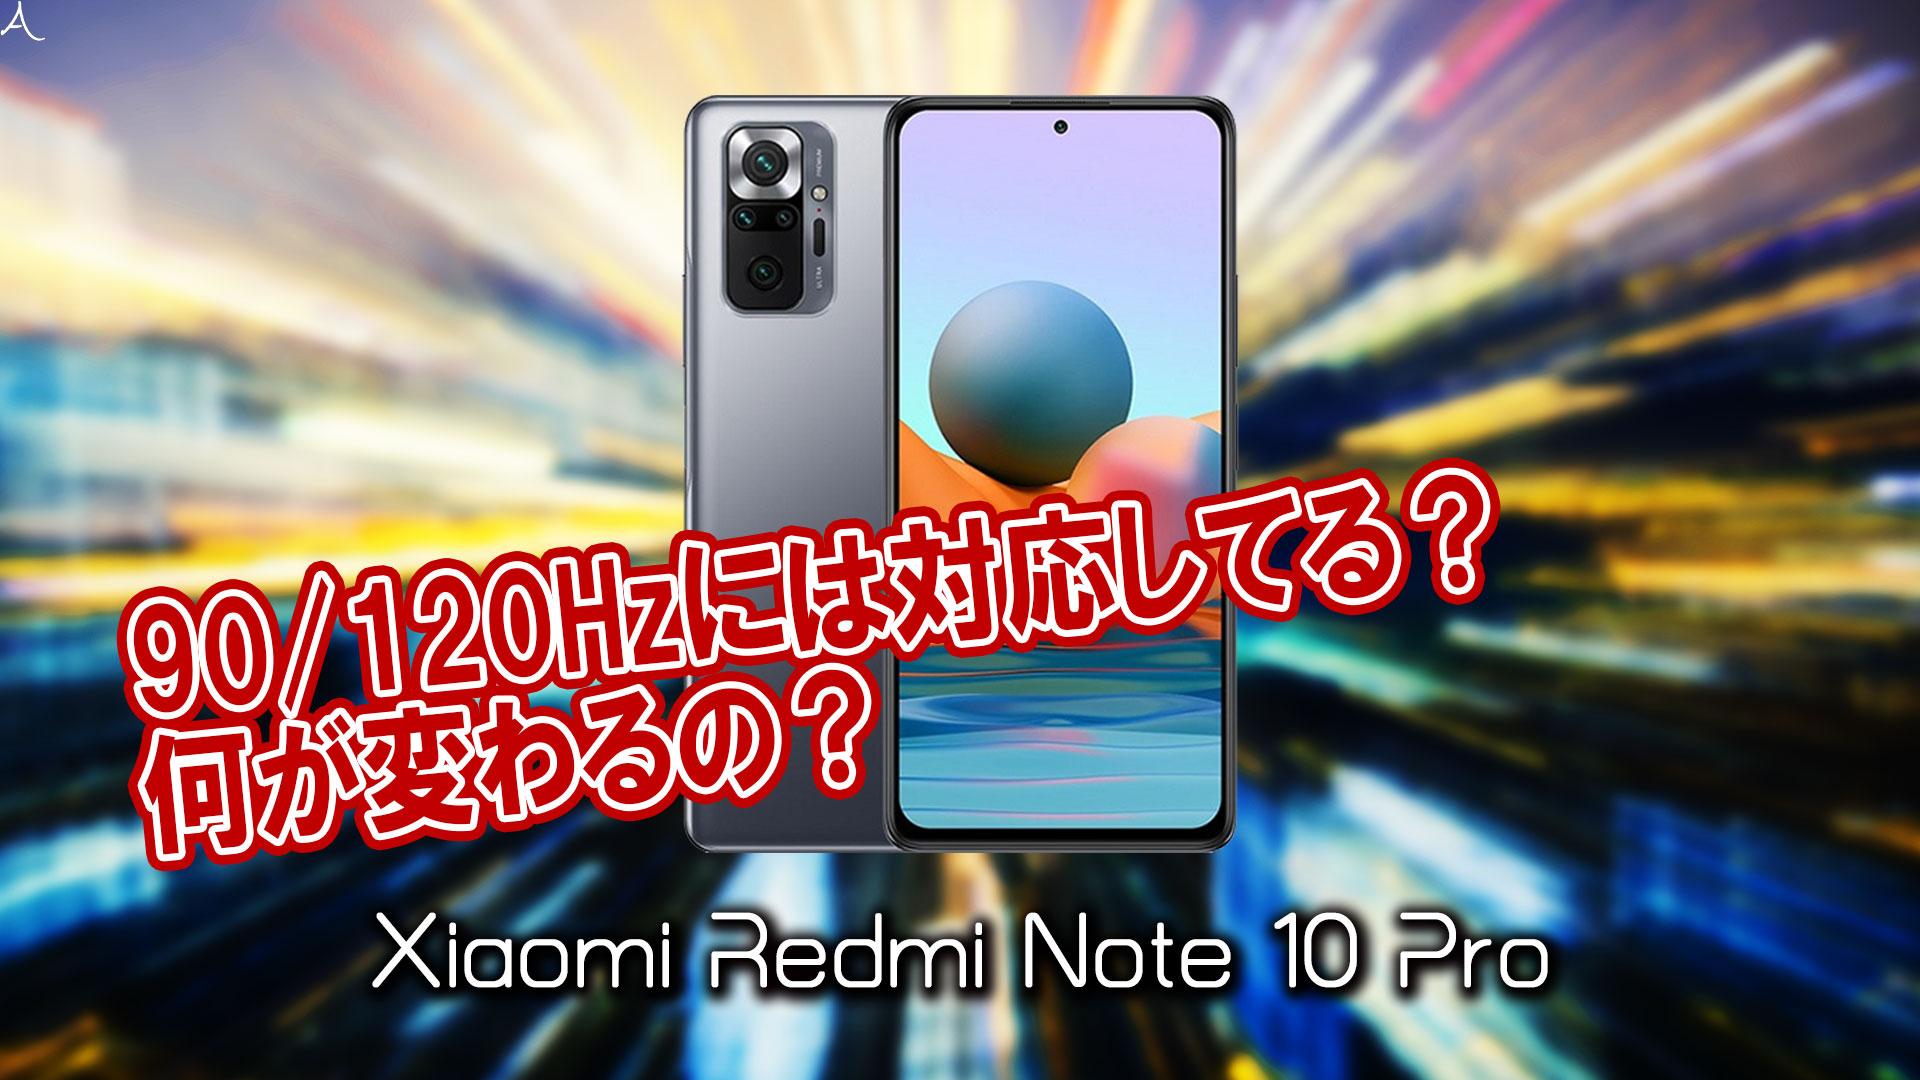 「Xiaomi Redmi Note 10 Pro」のリフレッシュレートはいくつ?120Hzには対応してる?